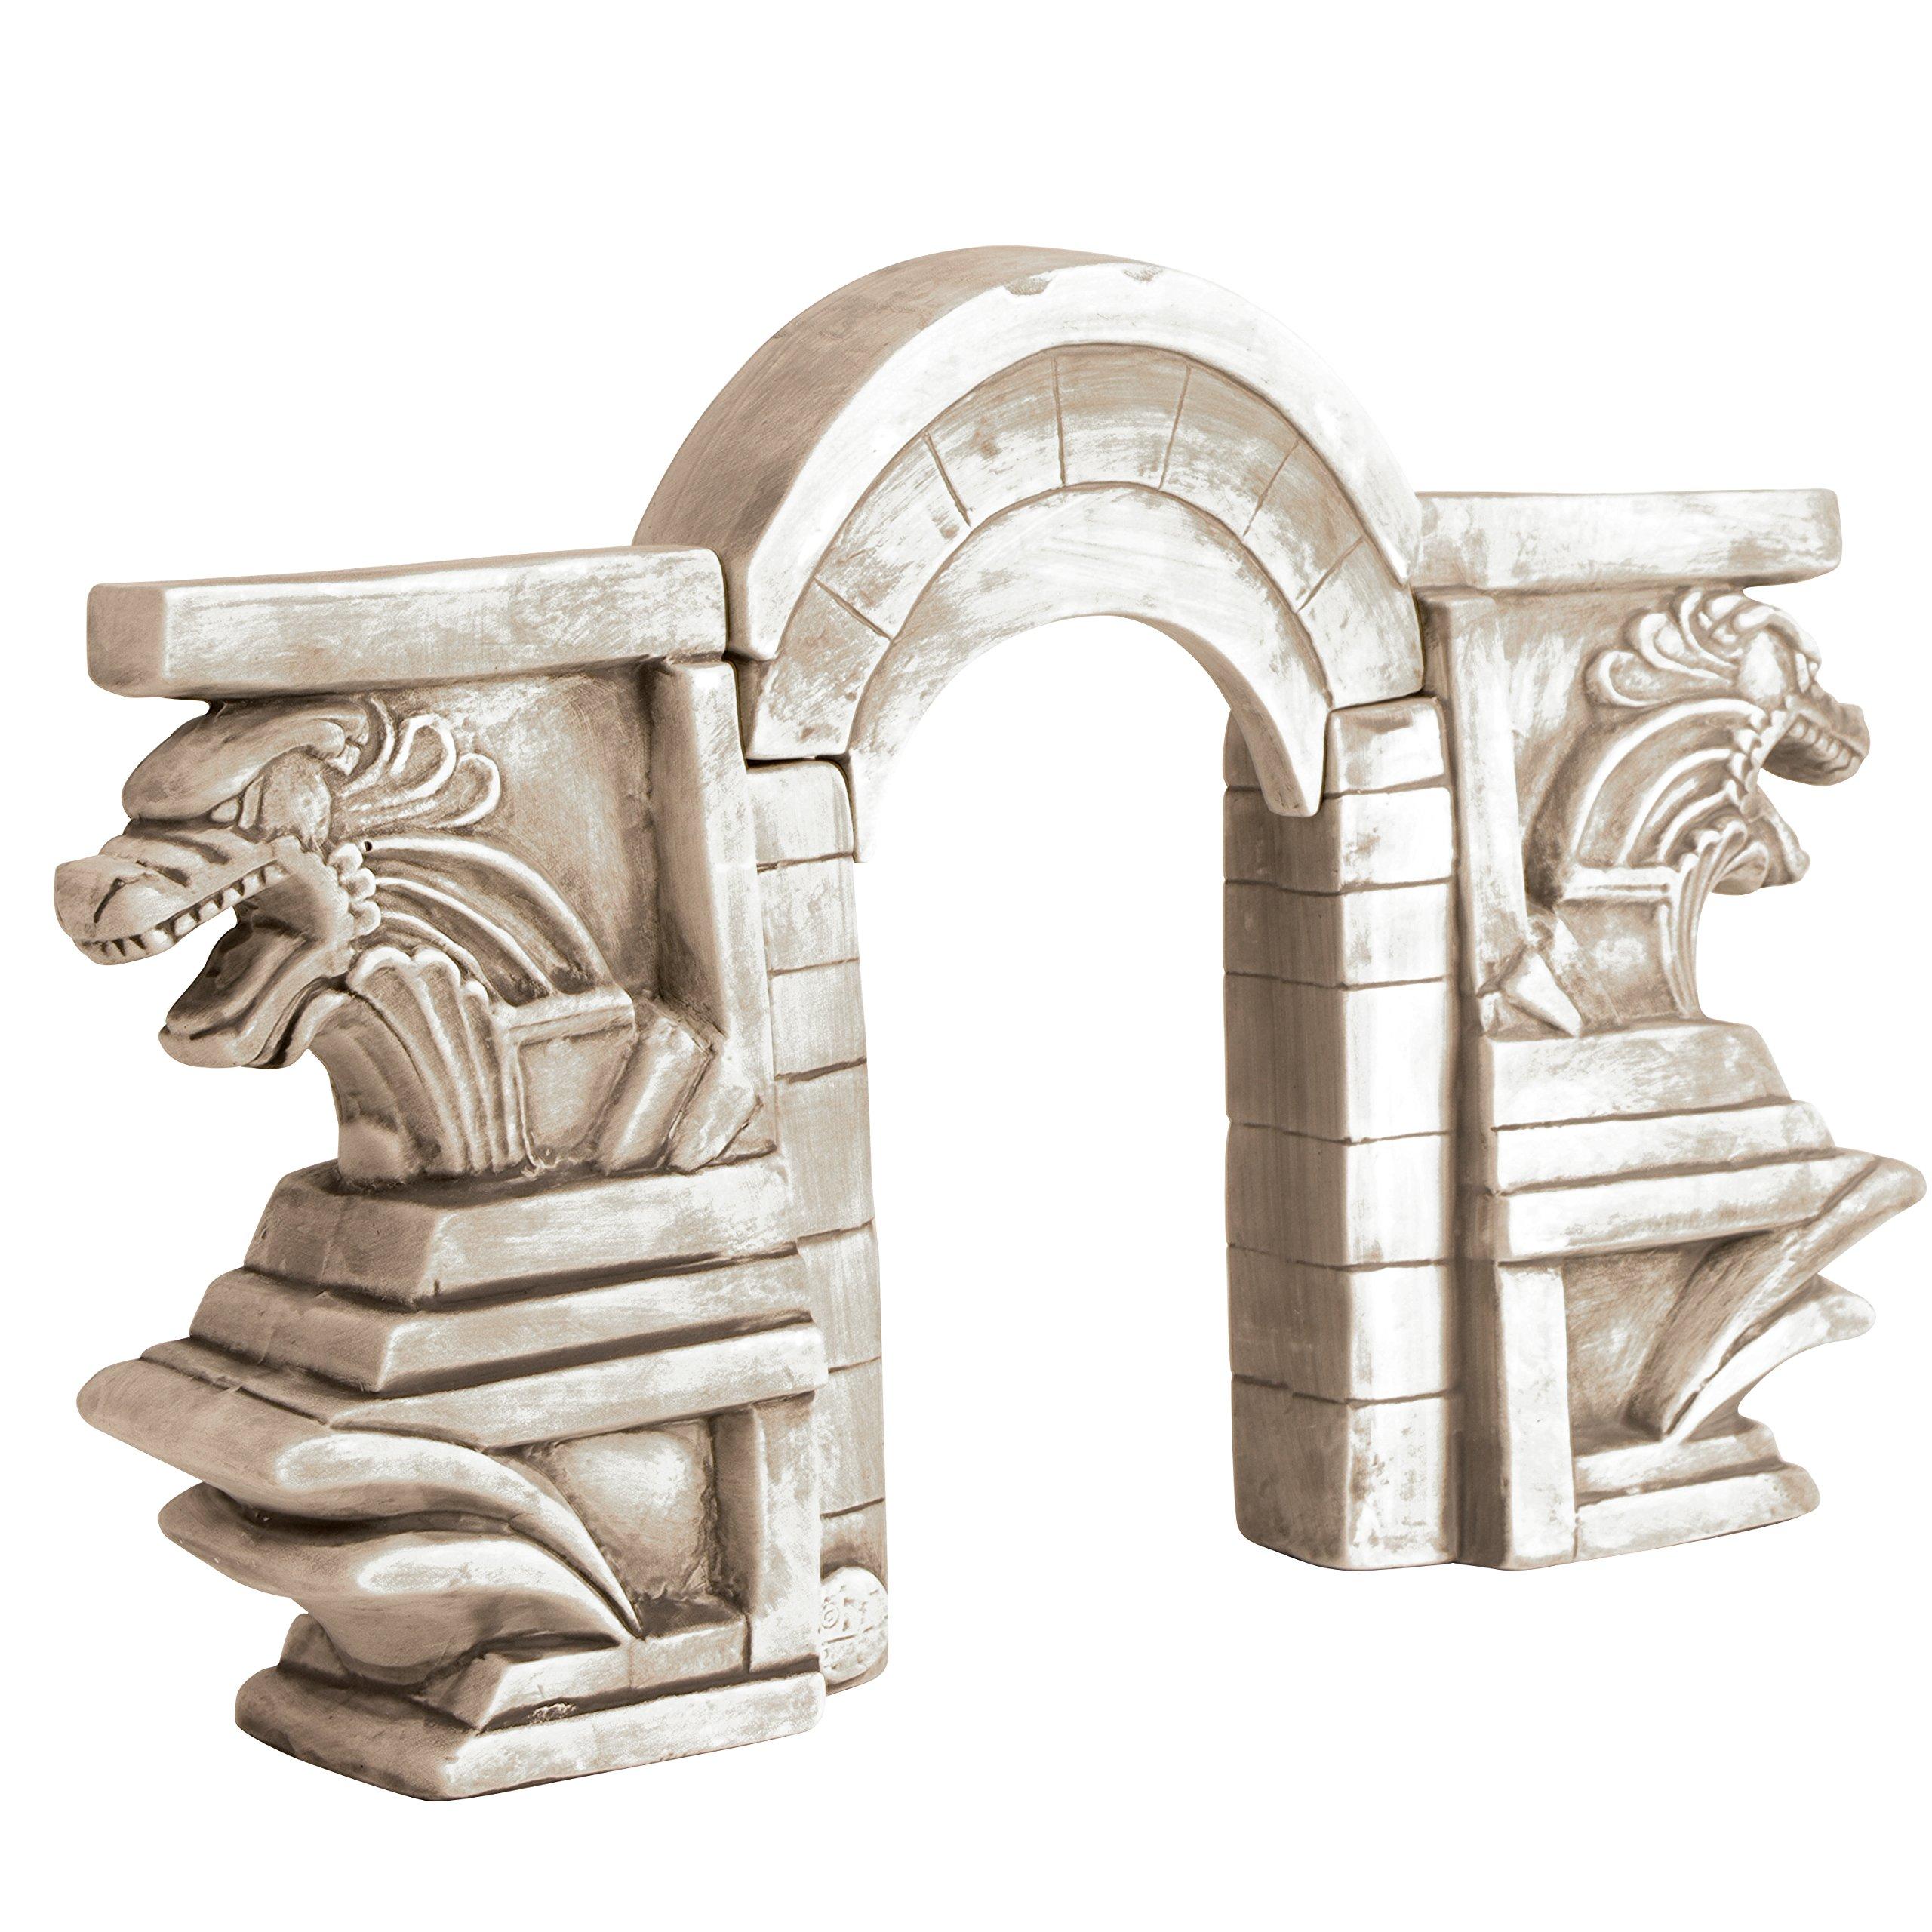 Marina Ceramic Ornaments, 3 Piece Stone Dragon Gate by Marina